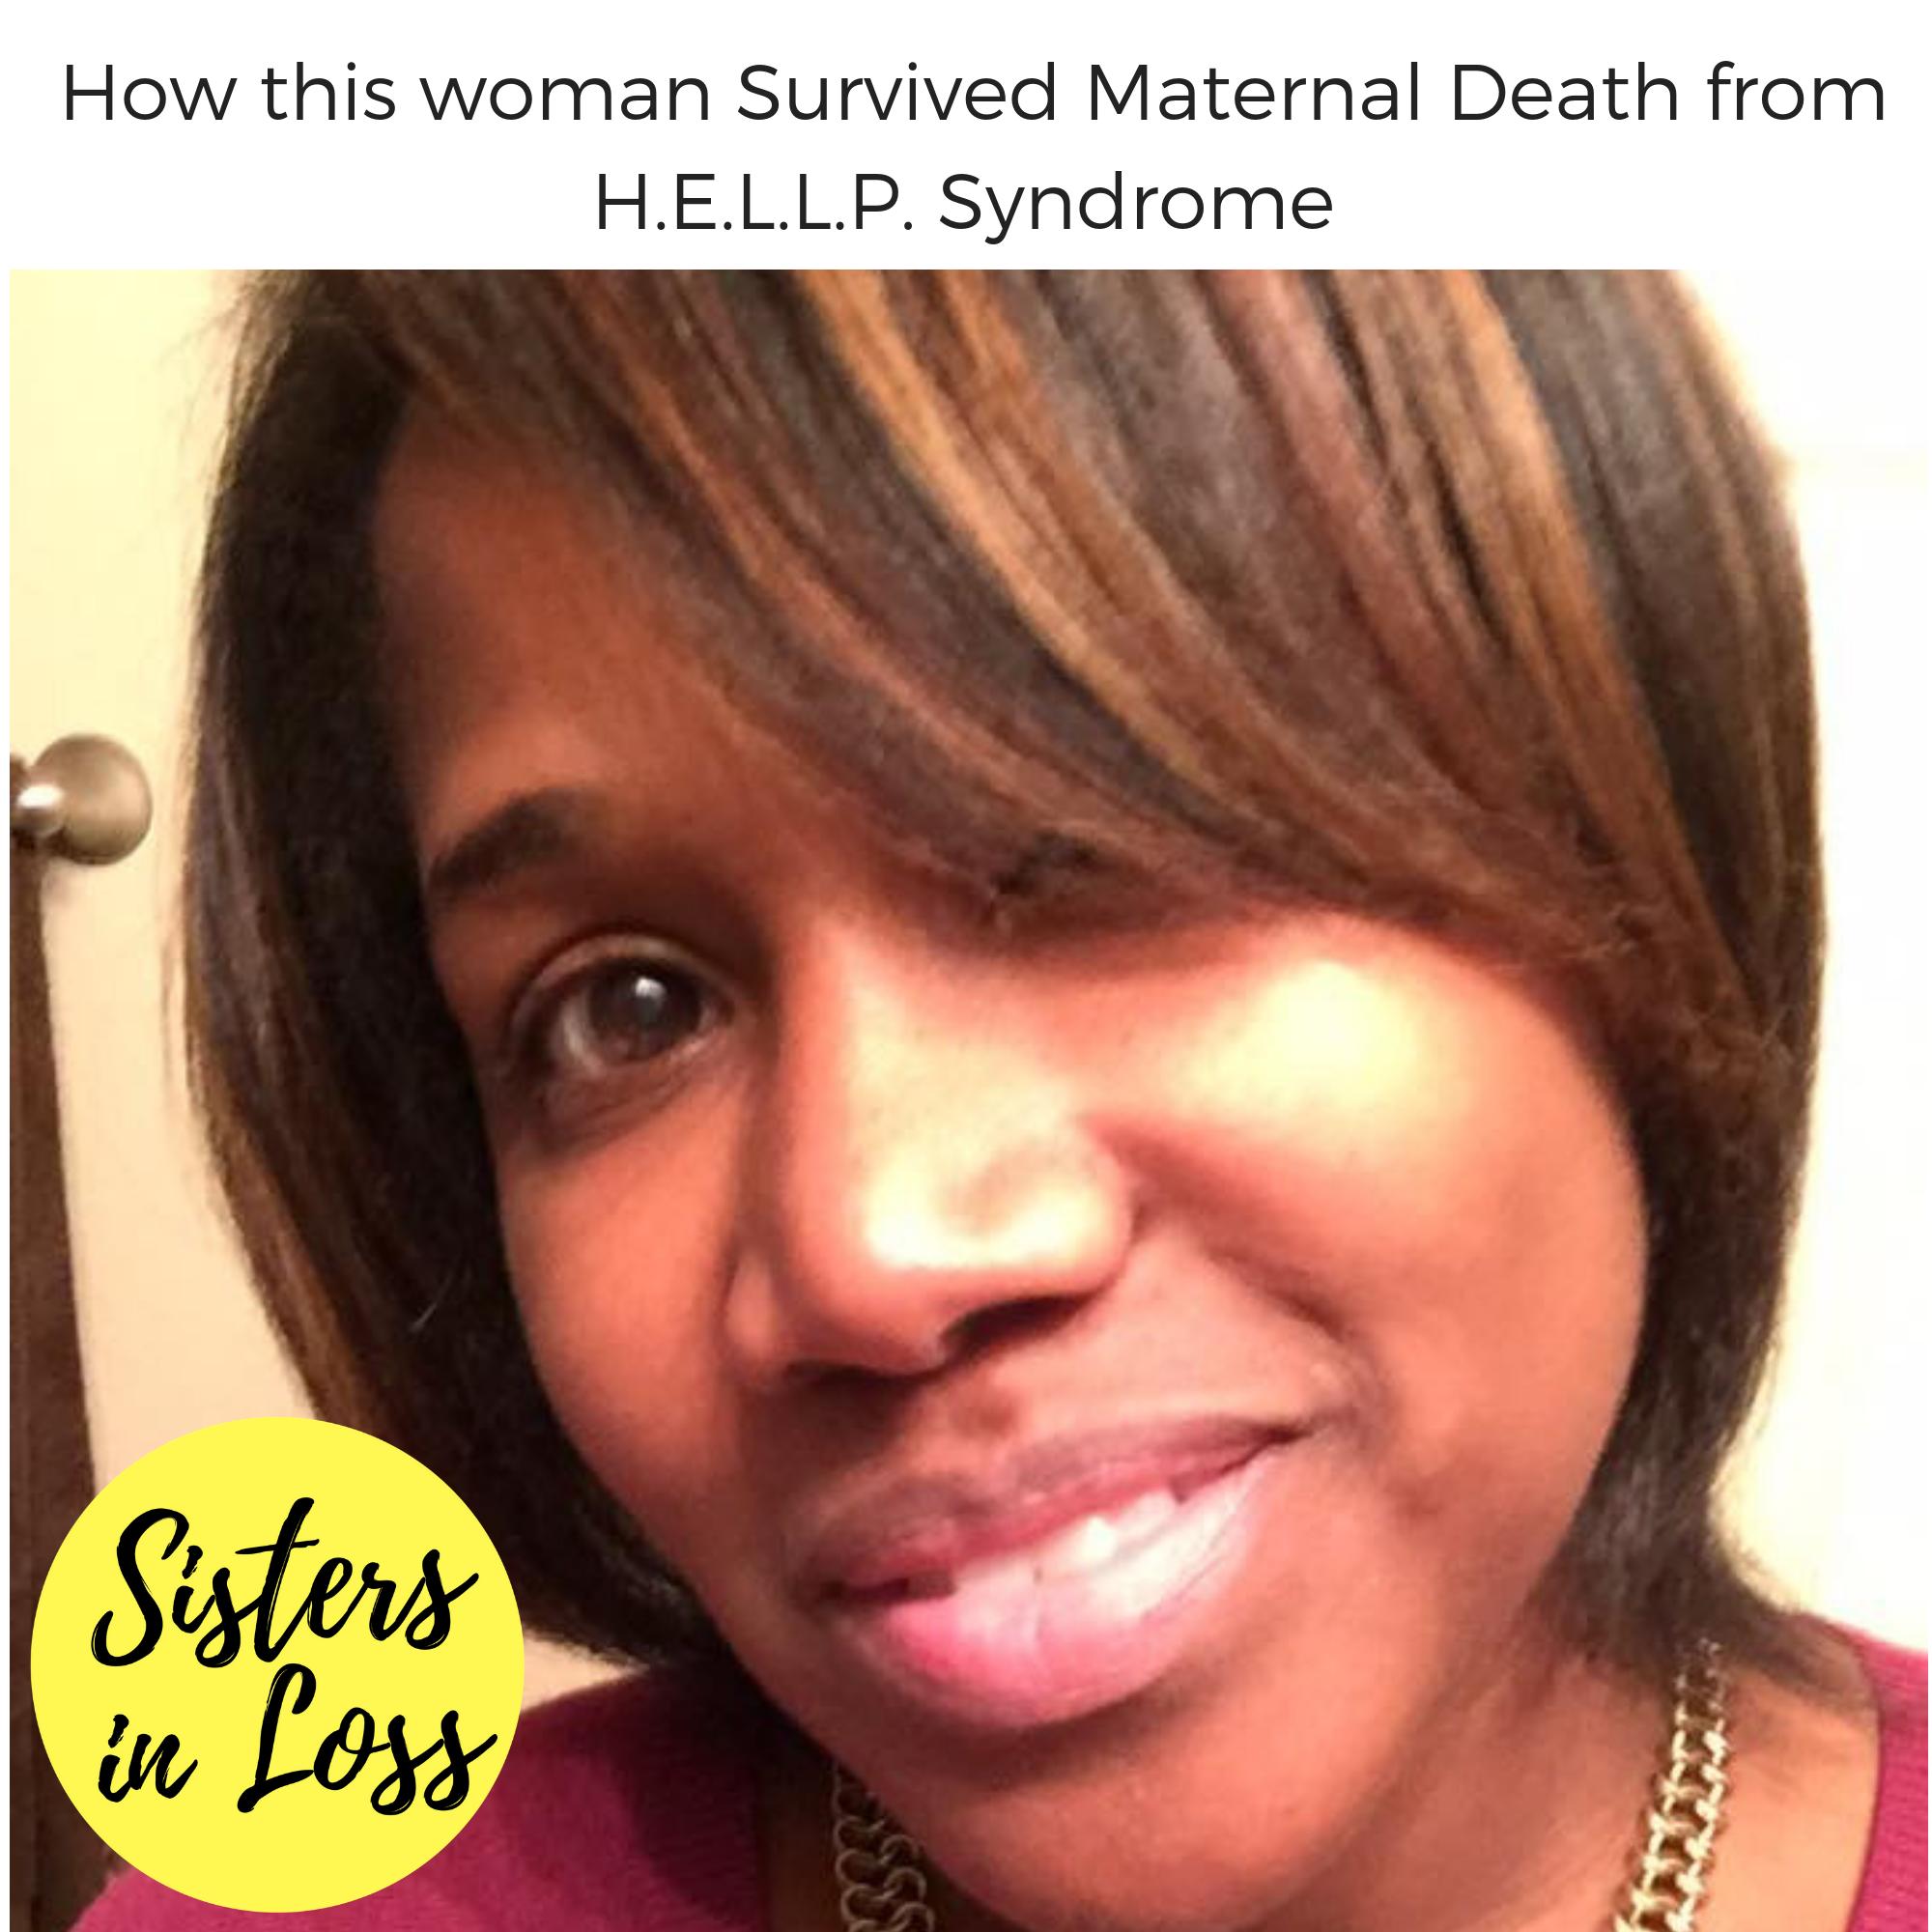 H.E.L.L.P Syndrome Survivor